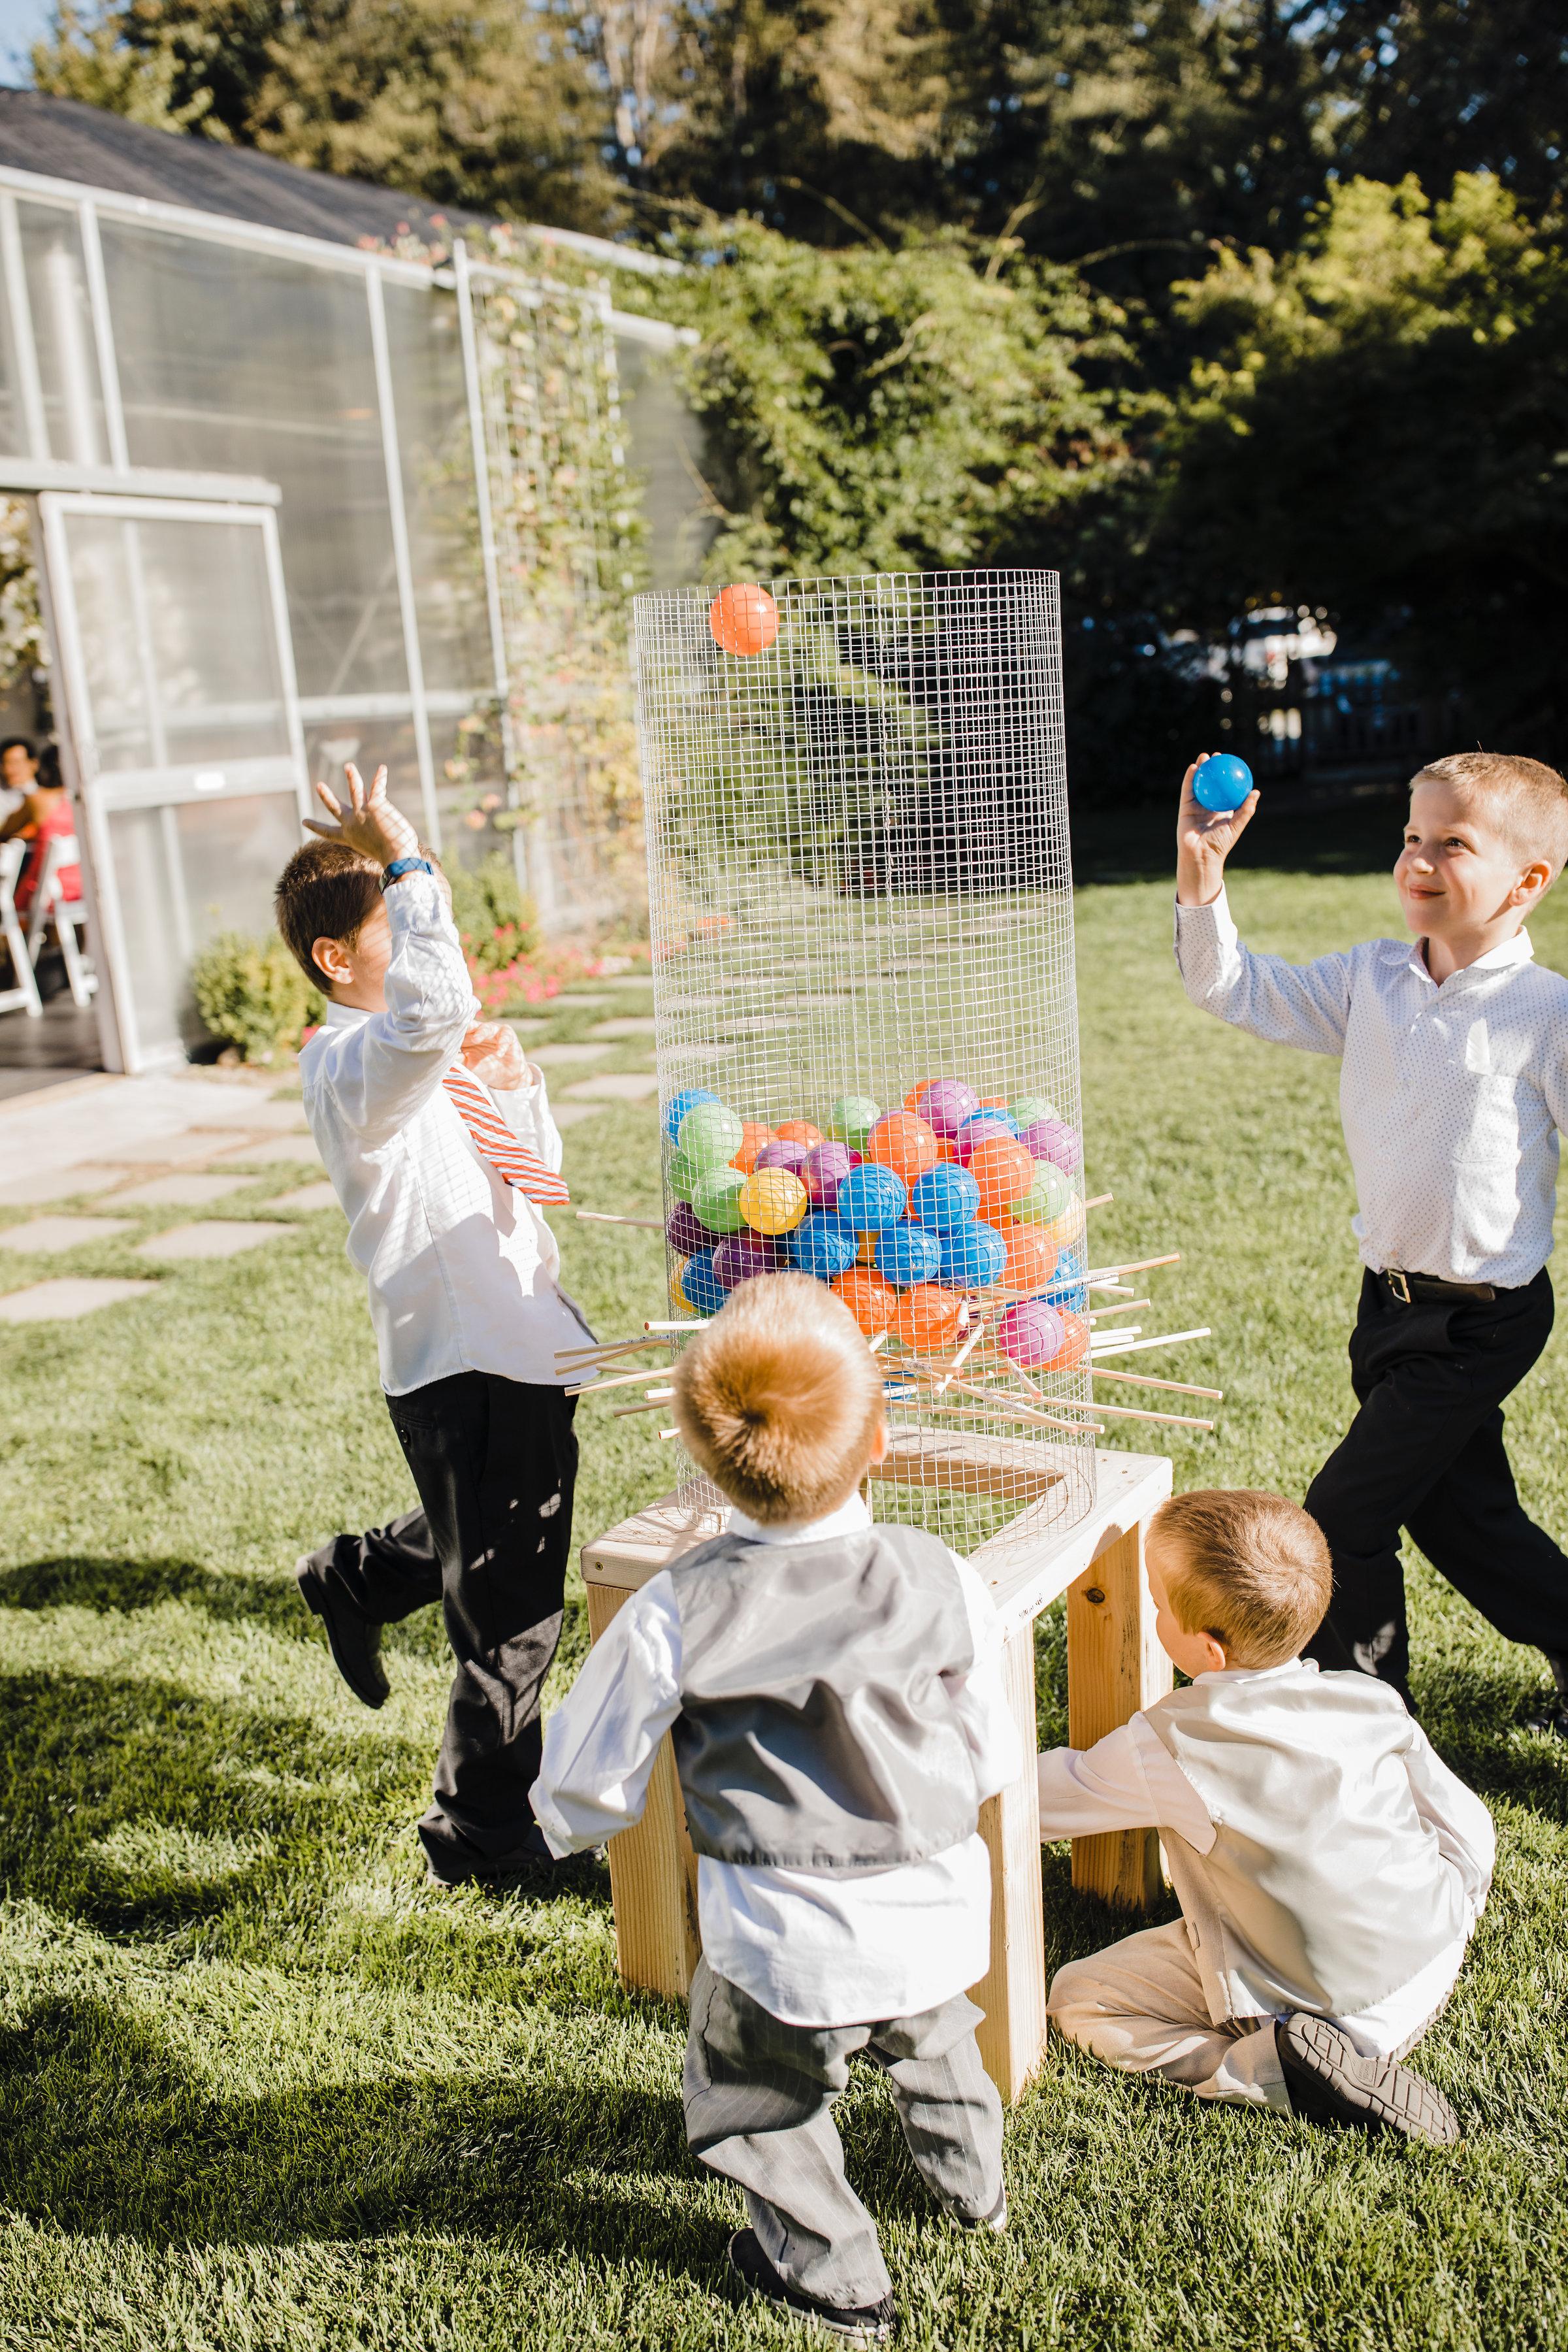 olympia washington wedding photographer outdoor reception lawn games kids